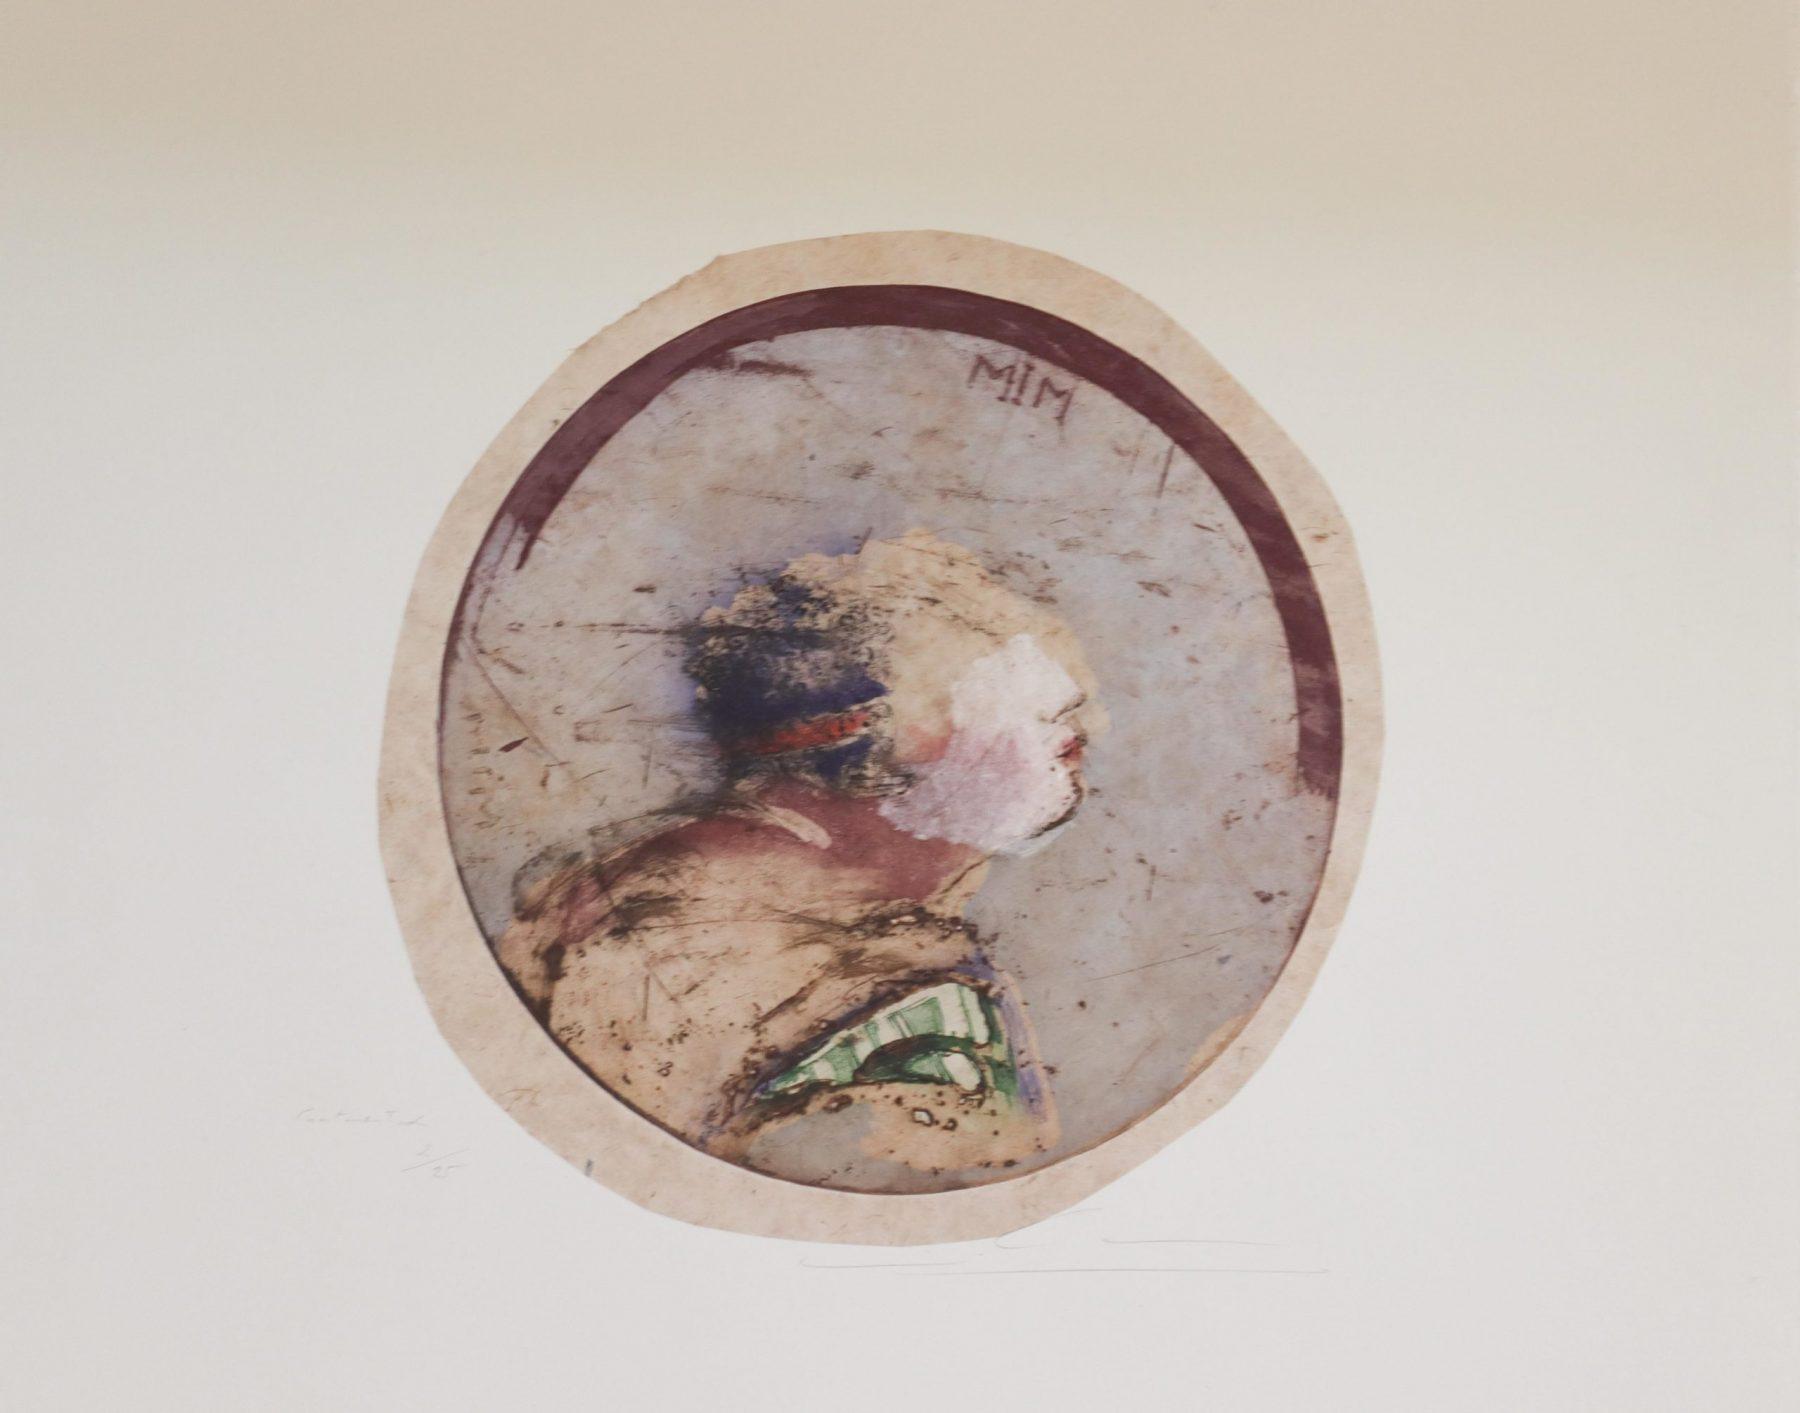 Continent - Canini, Sylviane - k-13233